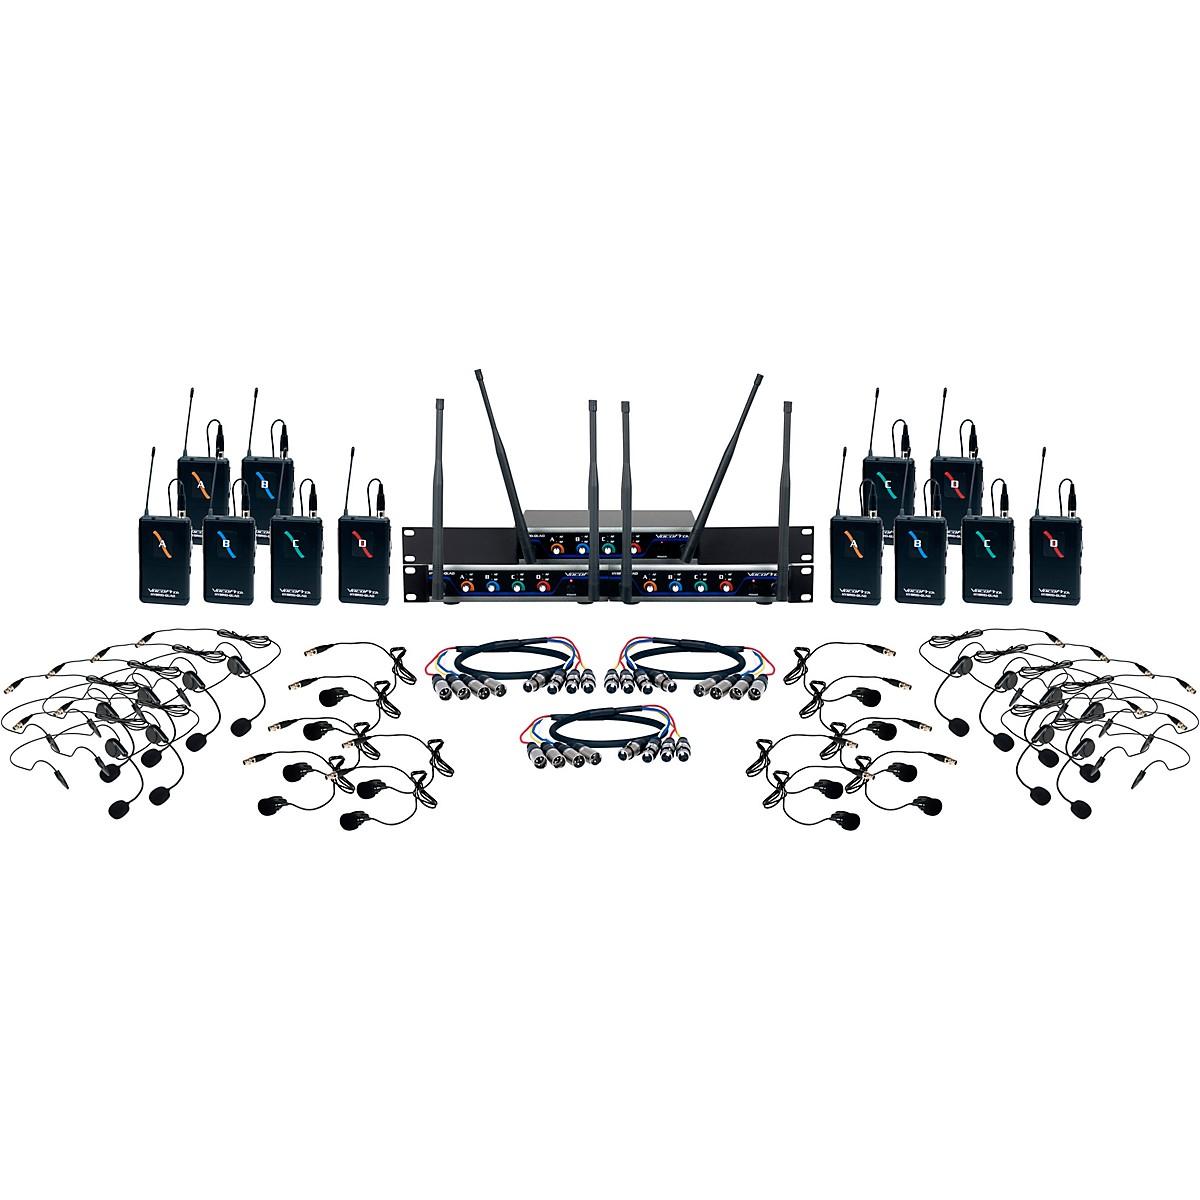 VocoPro Digital-Play-12 12-Channel UHF Wireless Headset/Lapel Microphone System